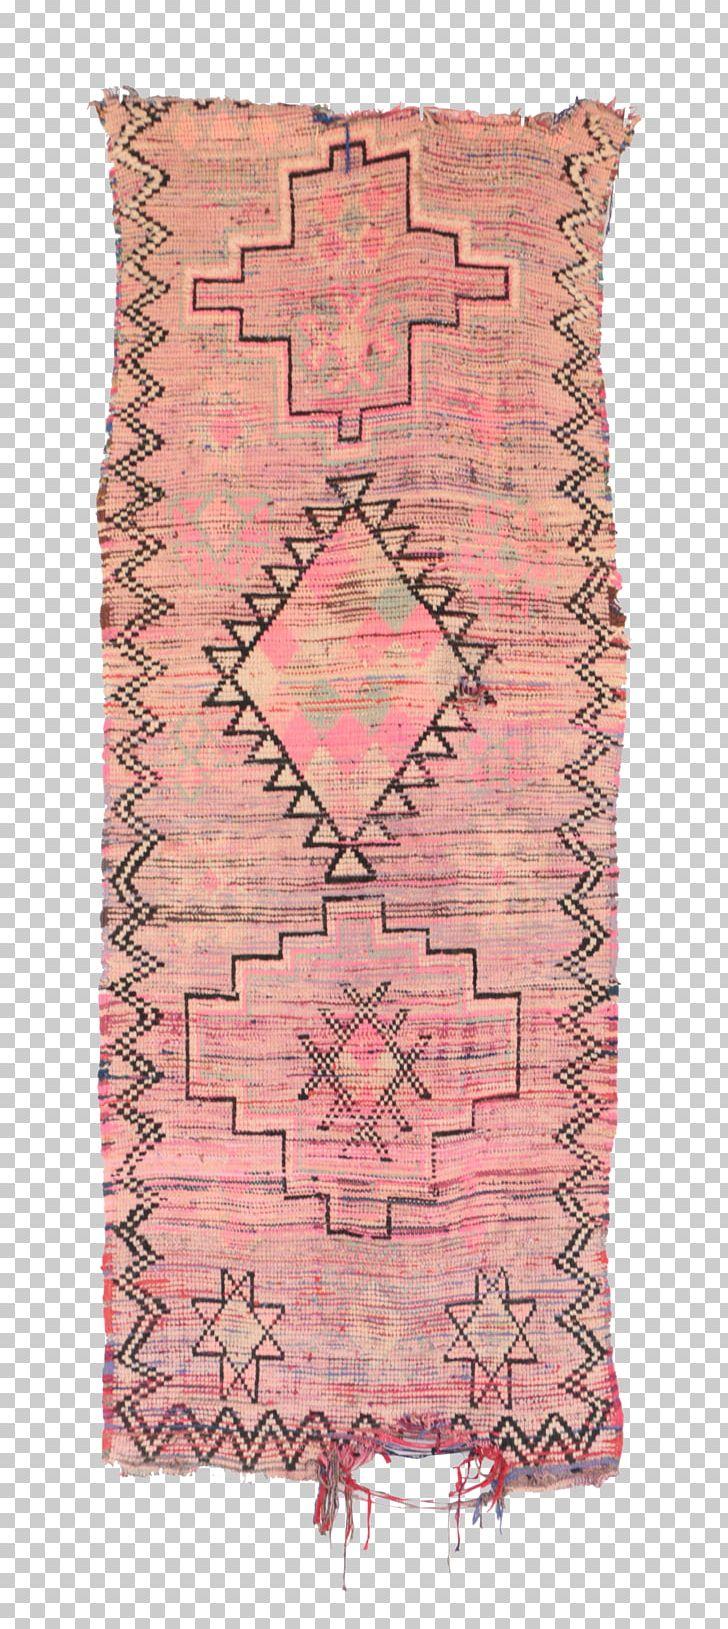 Carpet Indigo Lavender Indigo Moroccan Hand Woven Wool Pink